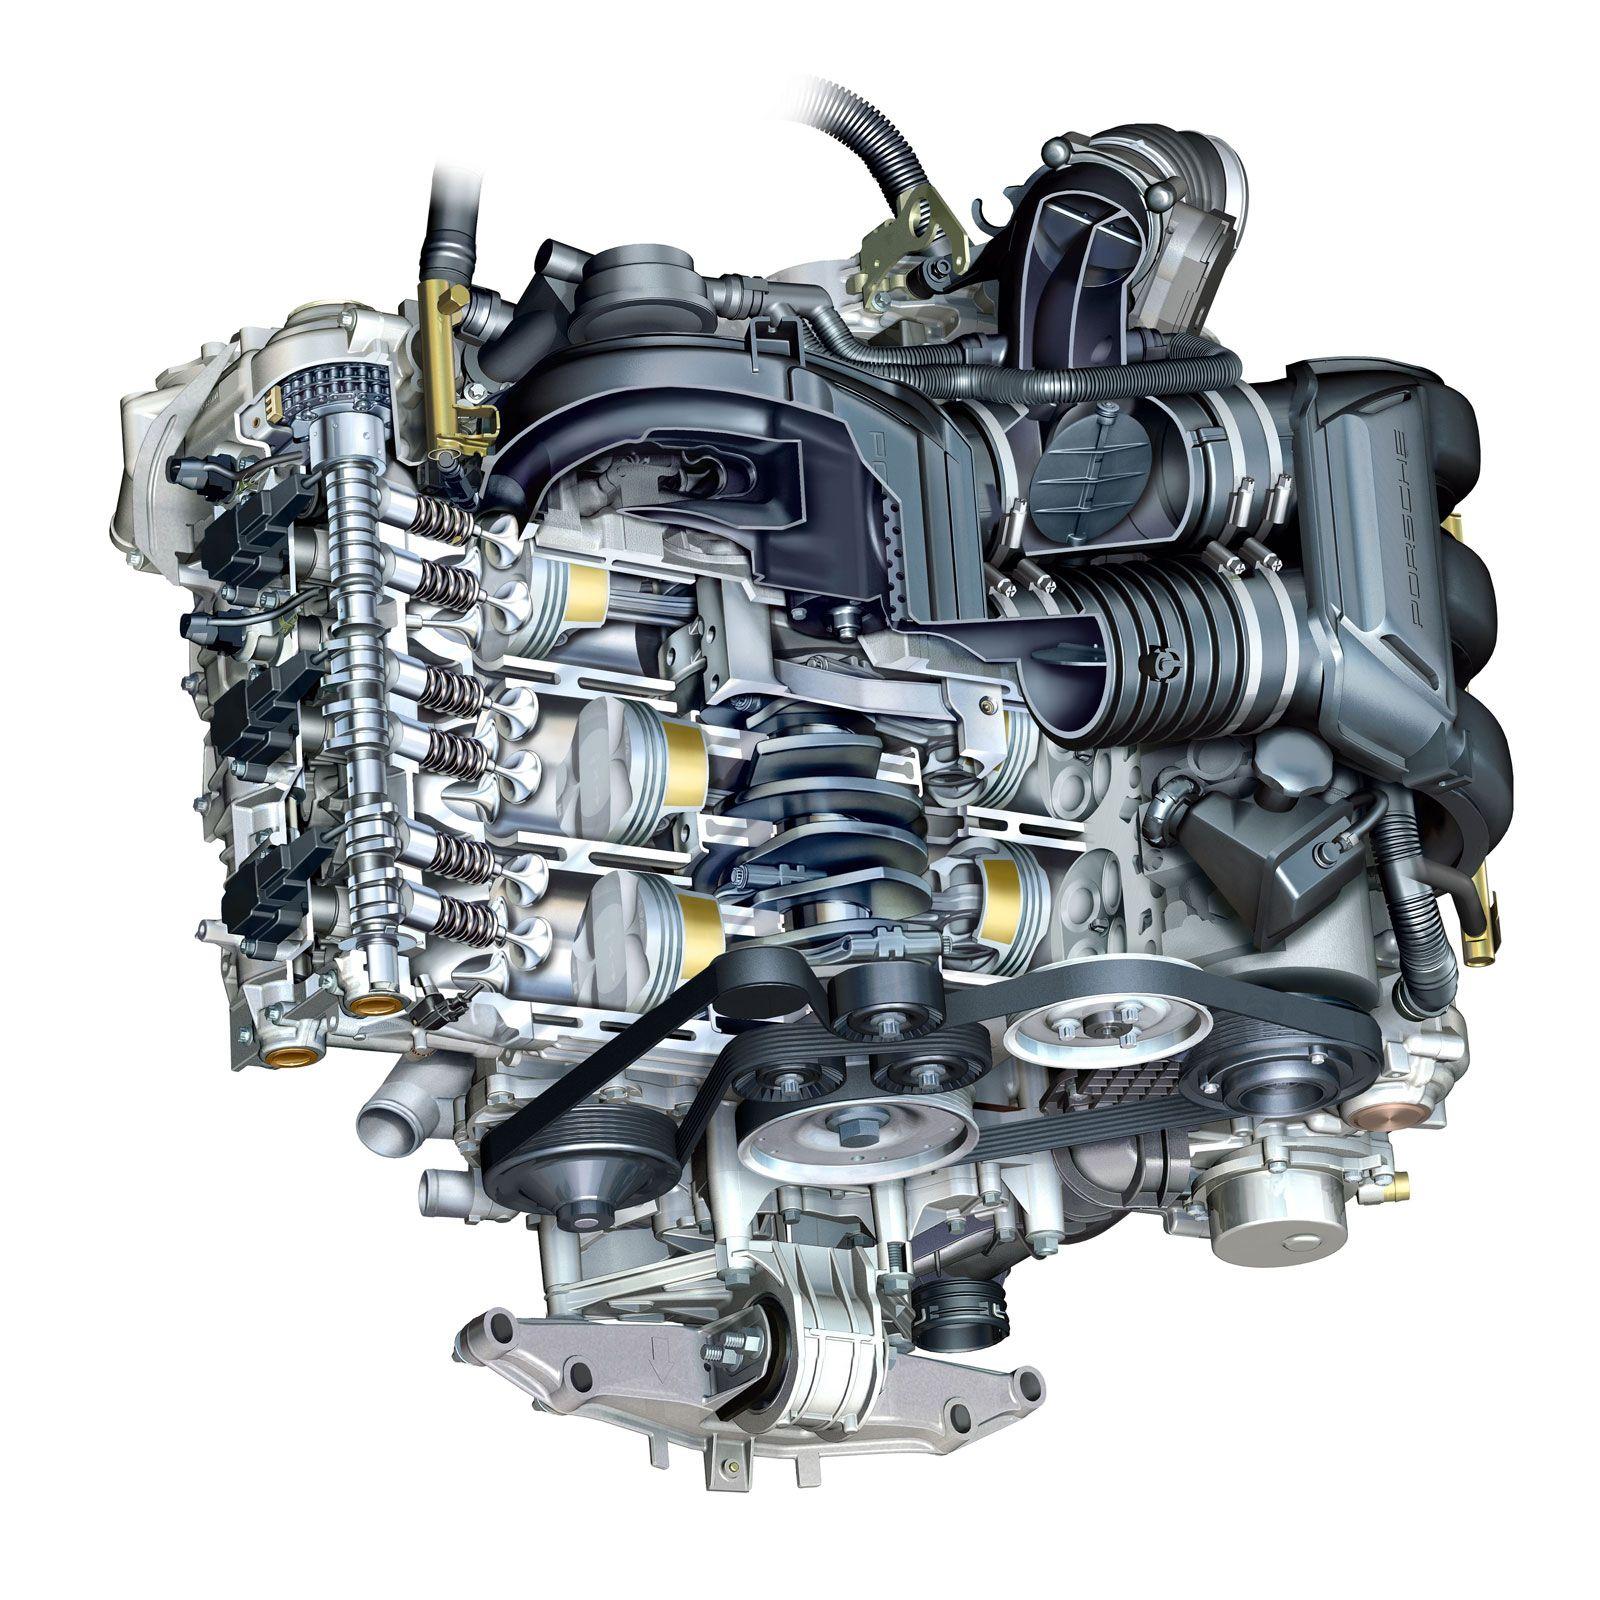 2007 Porsche Cayman S 295bhp 3 3l 0 60 N 5 1sec Horizontally Opposed Flat 6 Boxer Engine